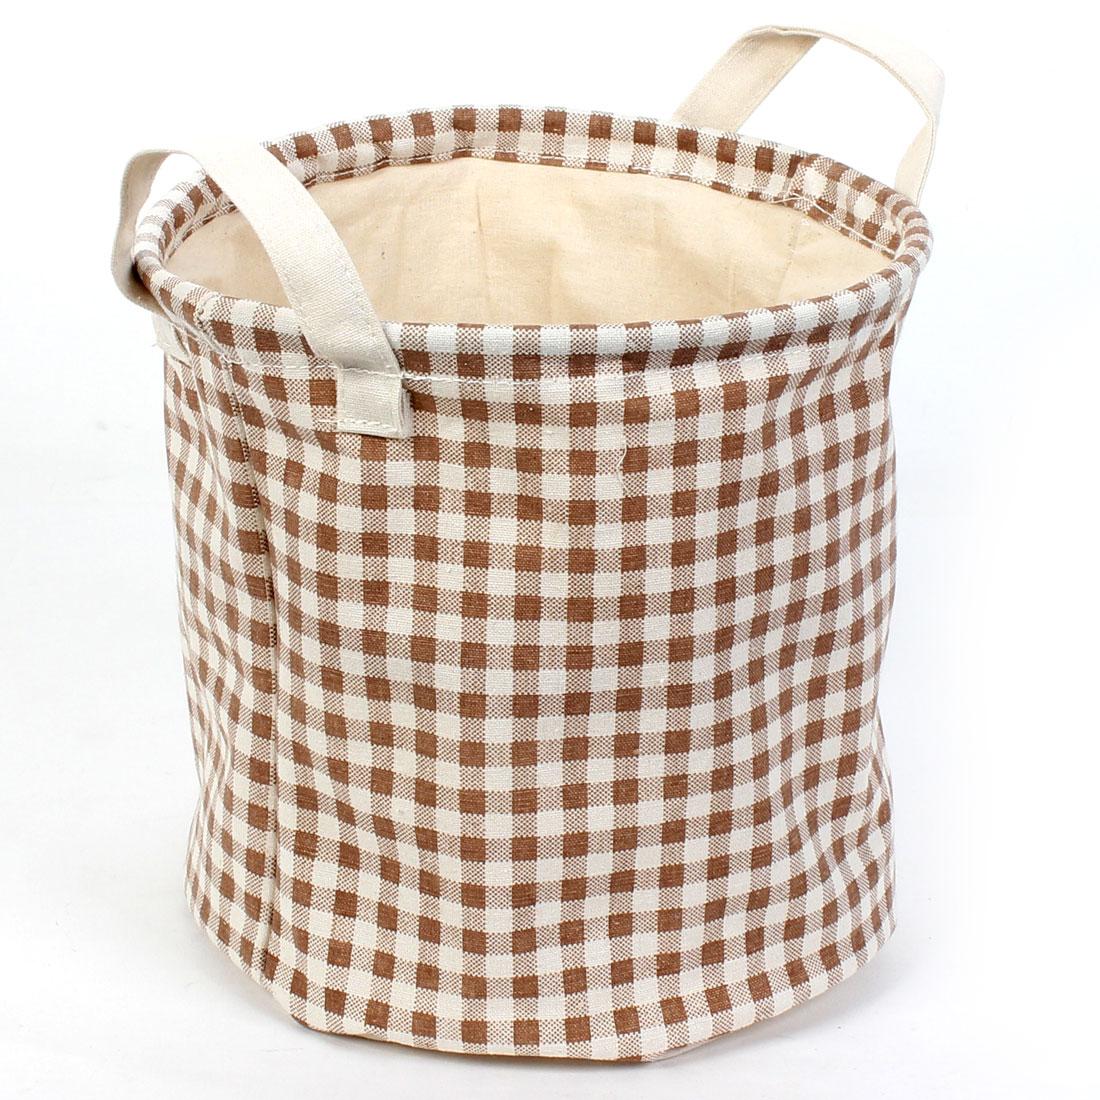 Home Cylinder Shaped Grid Pattern Drawstring Closure Storage Bucket Basket Organizer